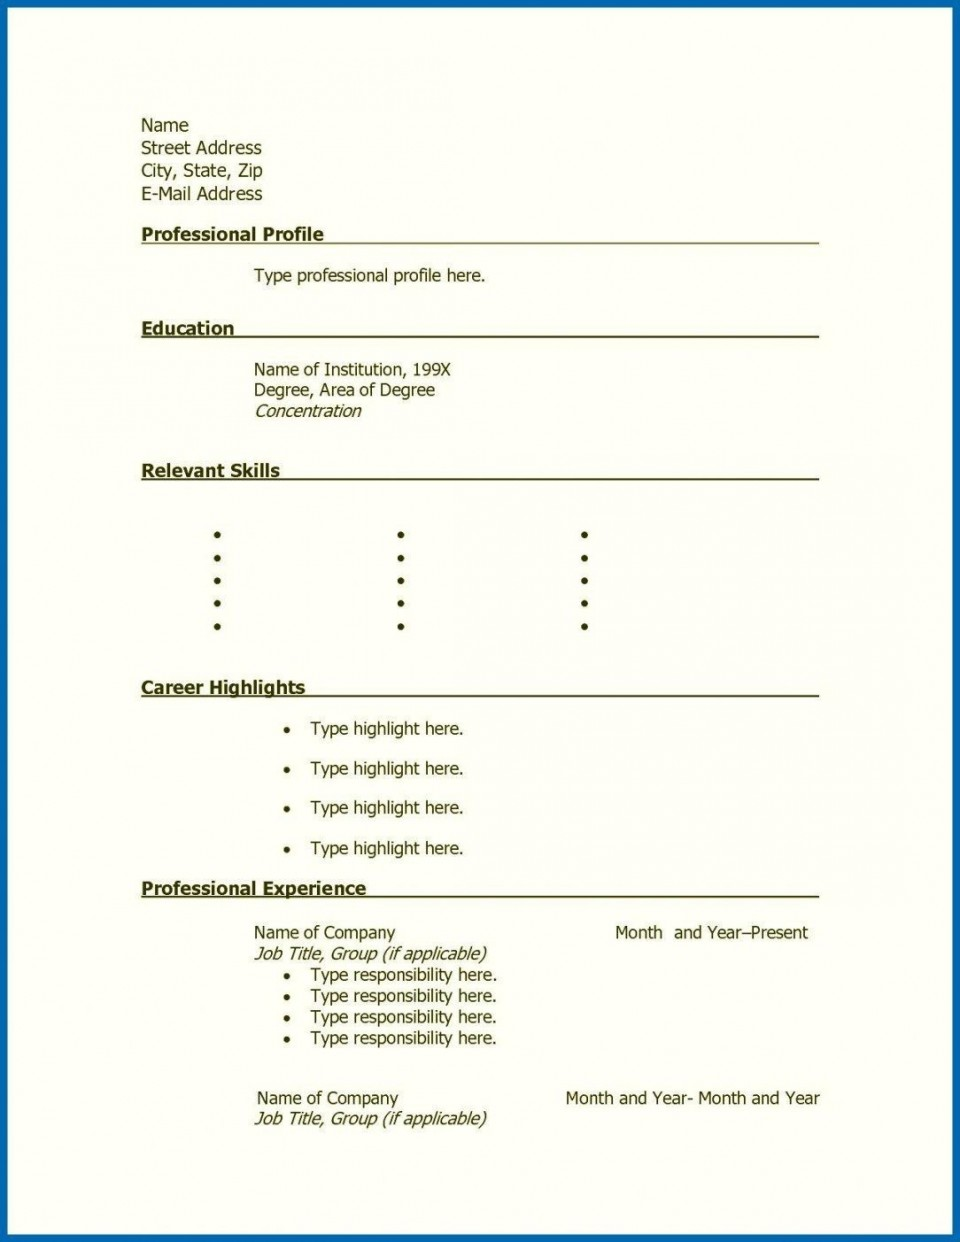 001 Stunning Free Printable Resume Template Blank Sample  Fill960